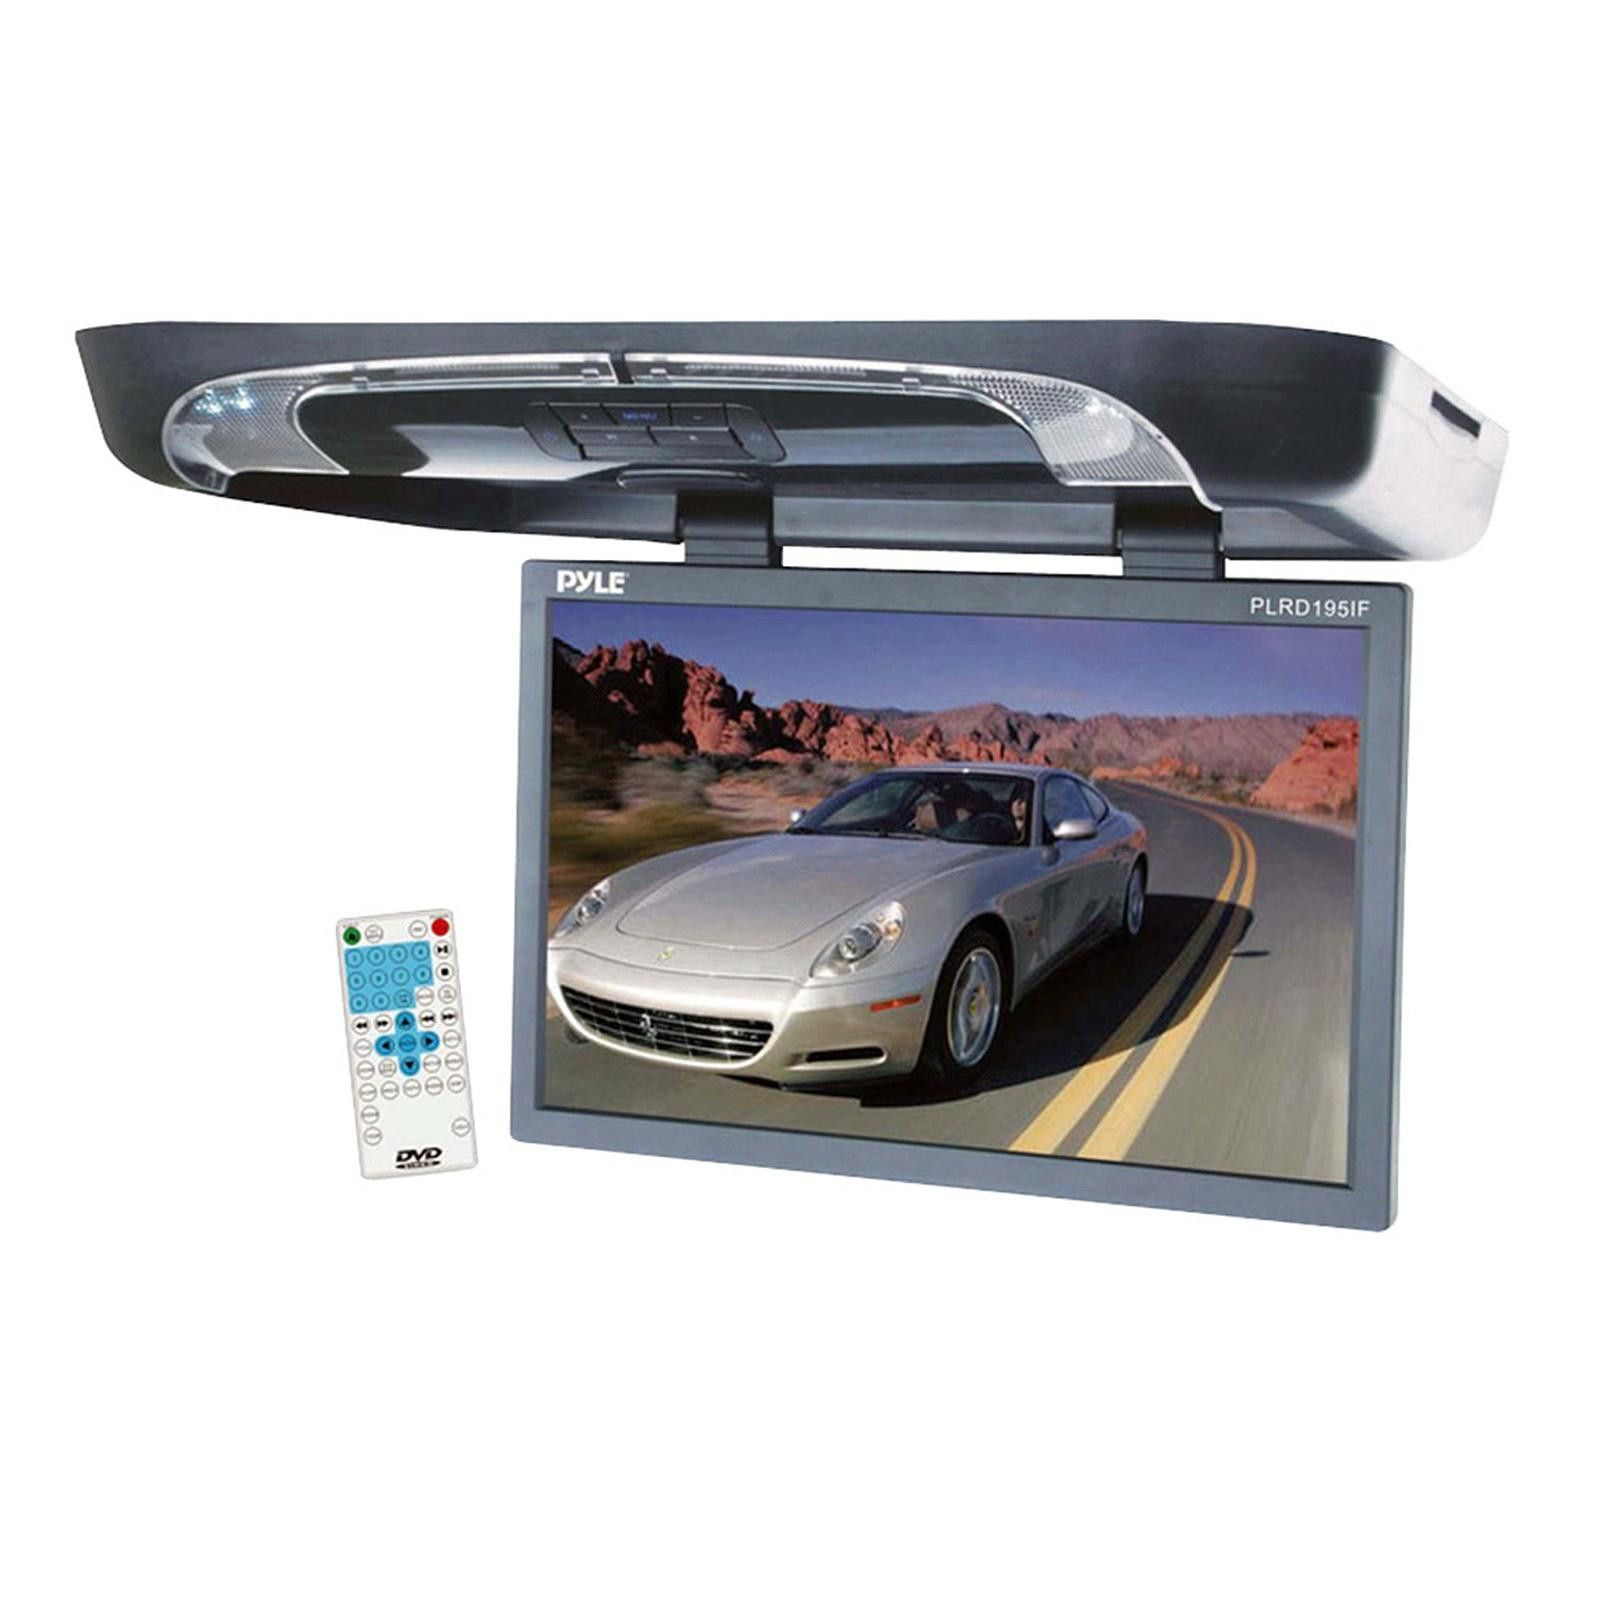 Pyle 19'' Flip Down with Built In DVD-SD-USB Player, Wireless FM- Modulator & IR Transmitter